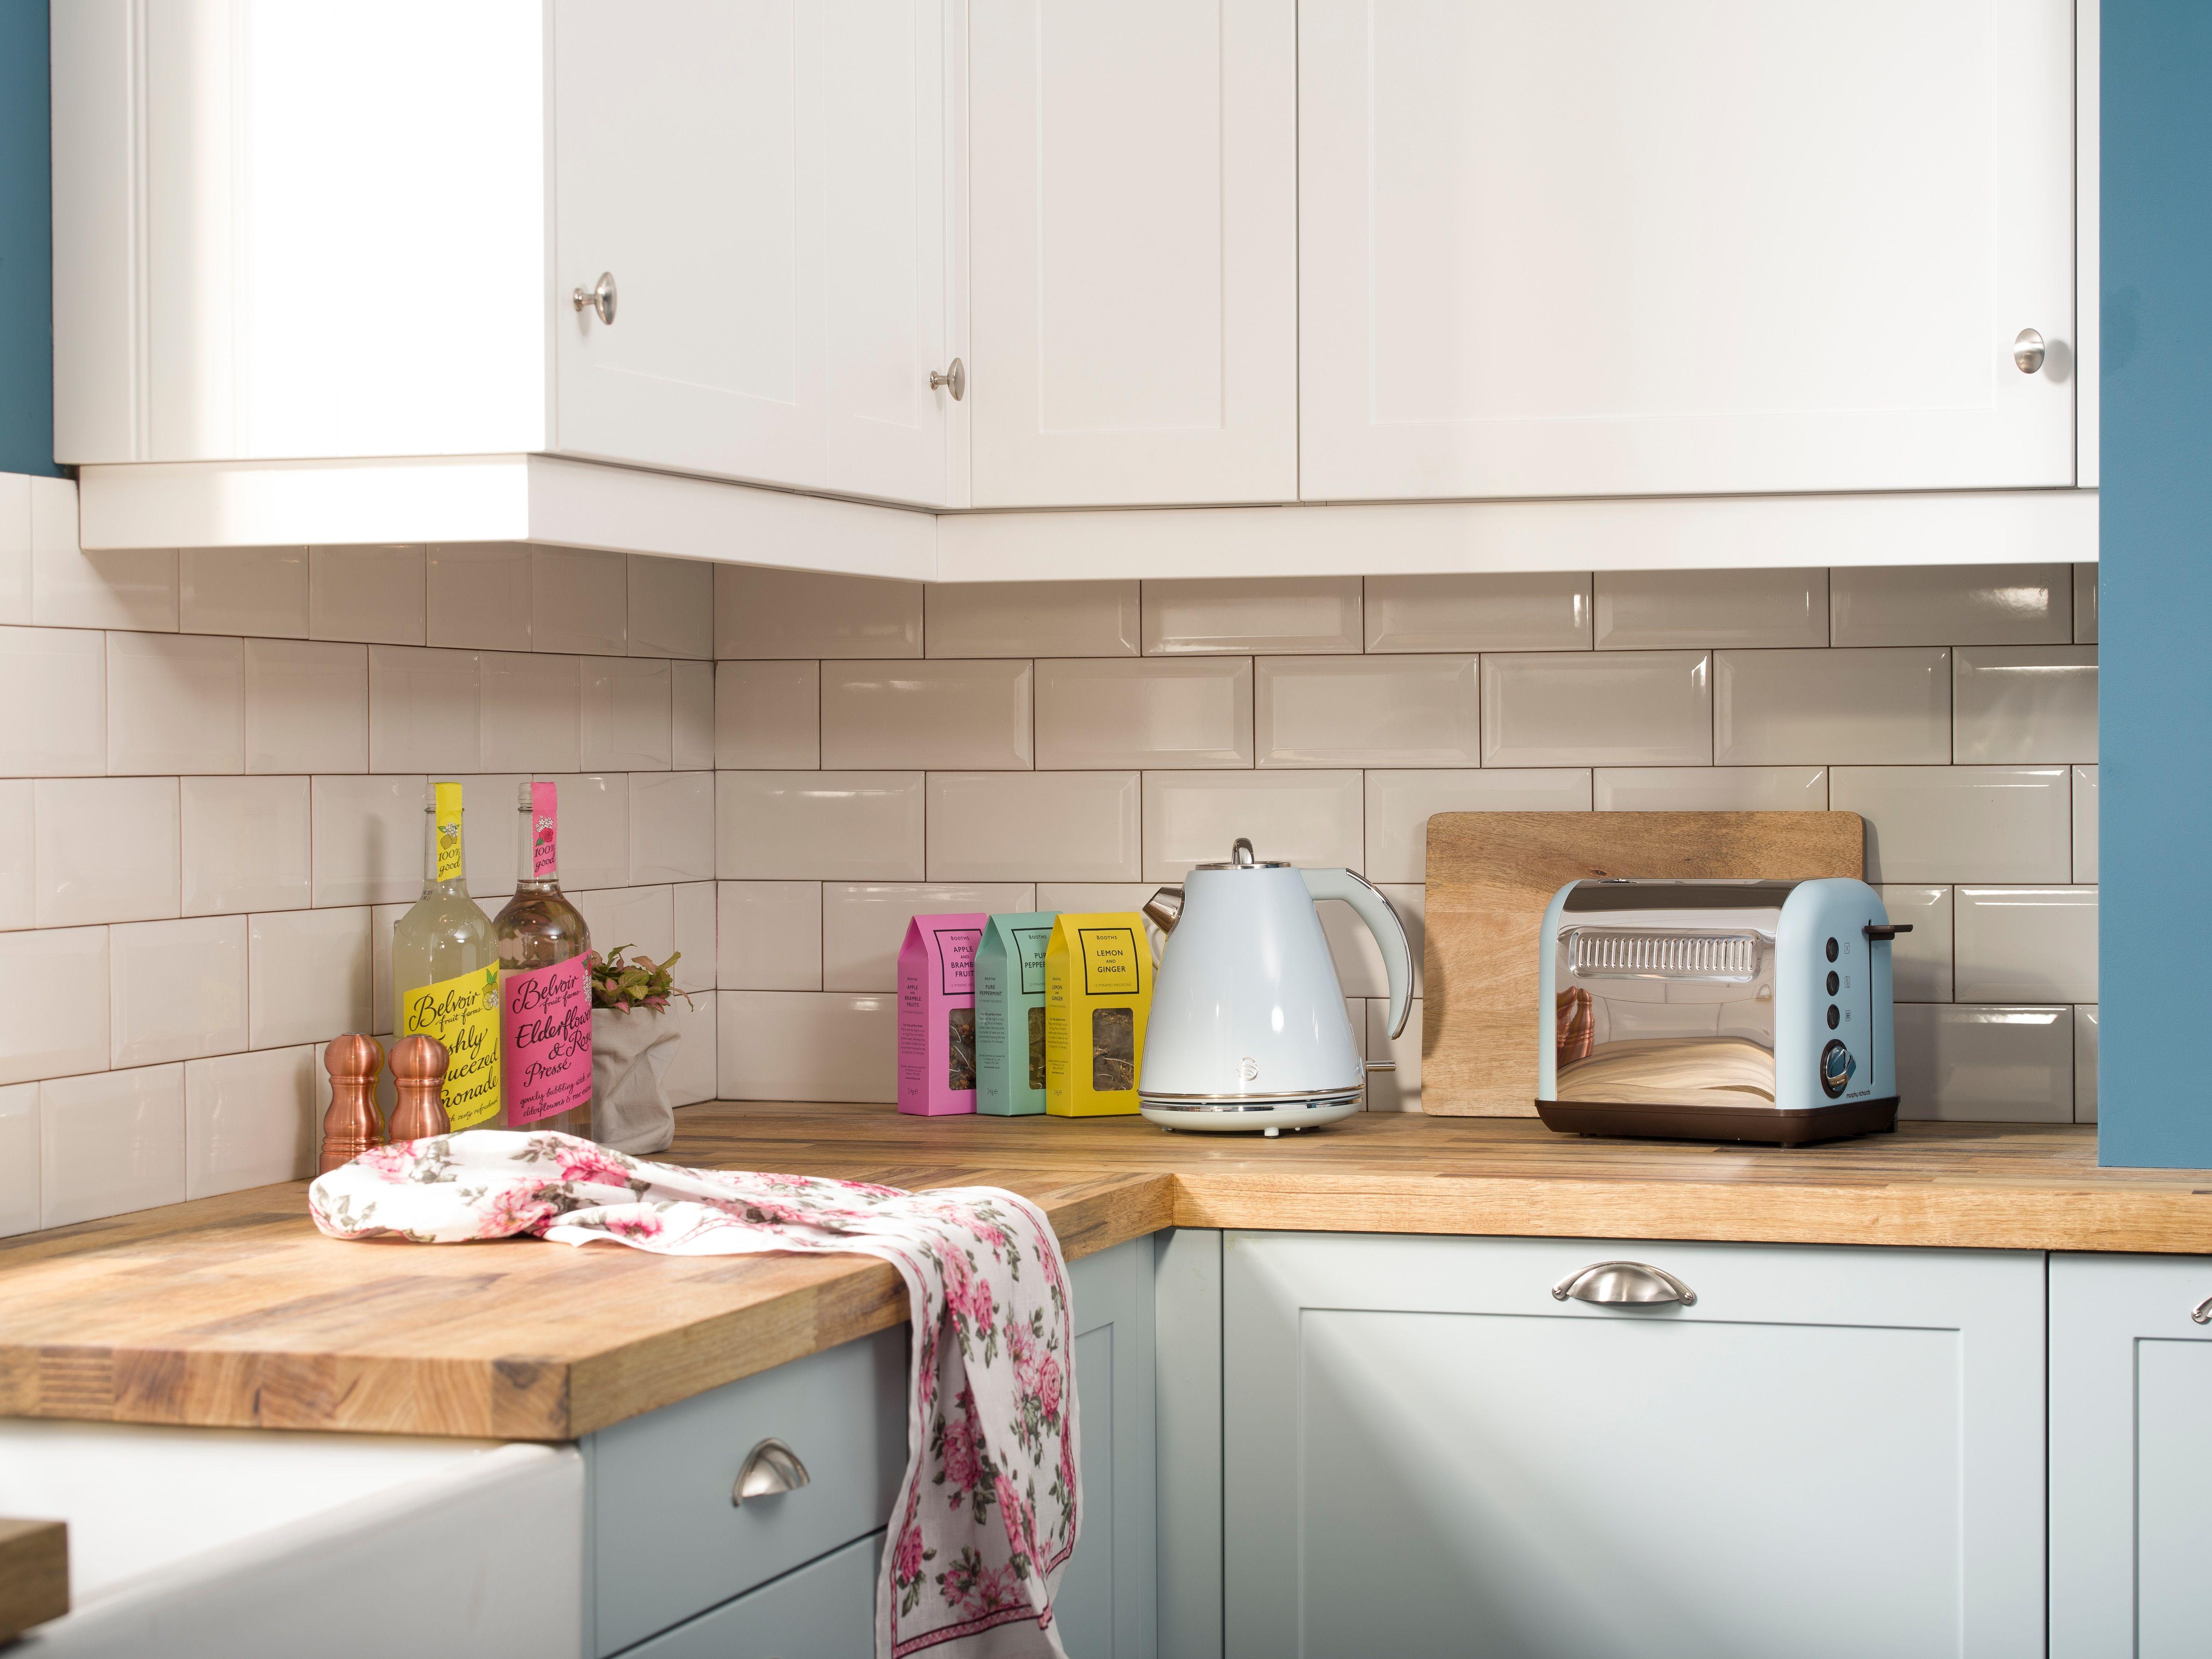 Worktop Ice cream shades in the kitchen Cool kitchens